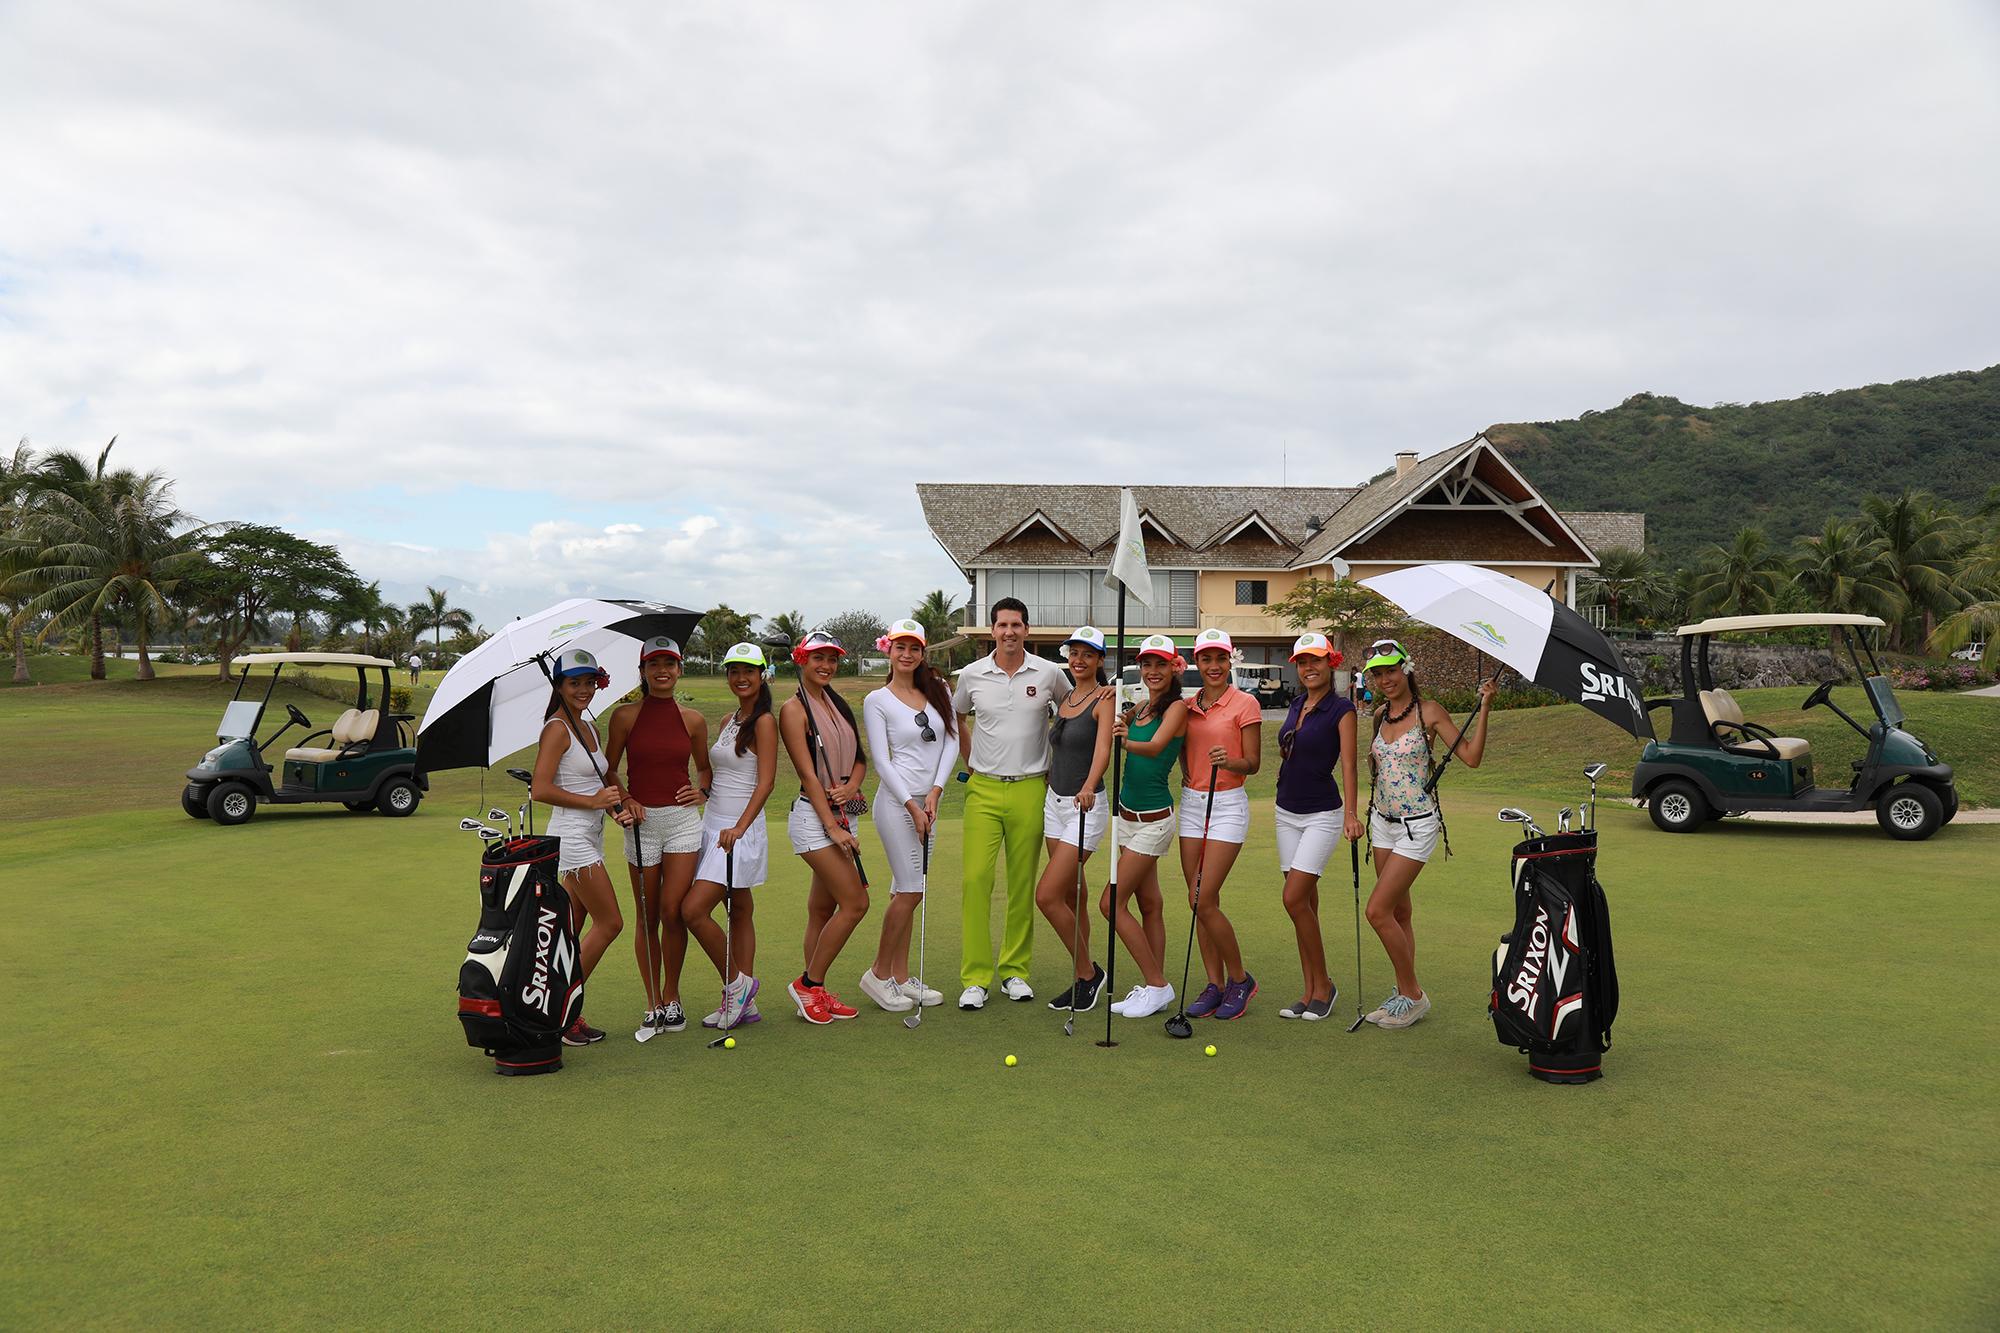 crédit photo : Tahiti Infos